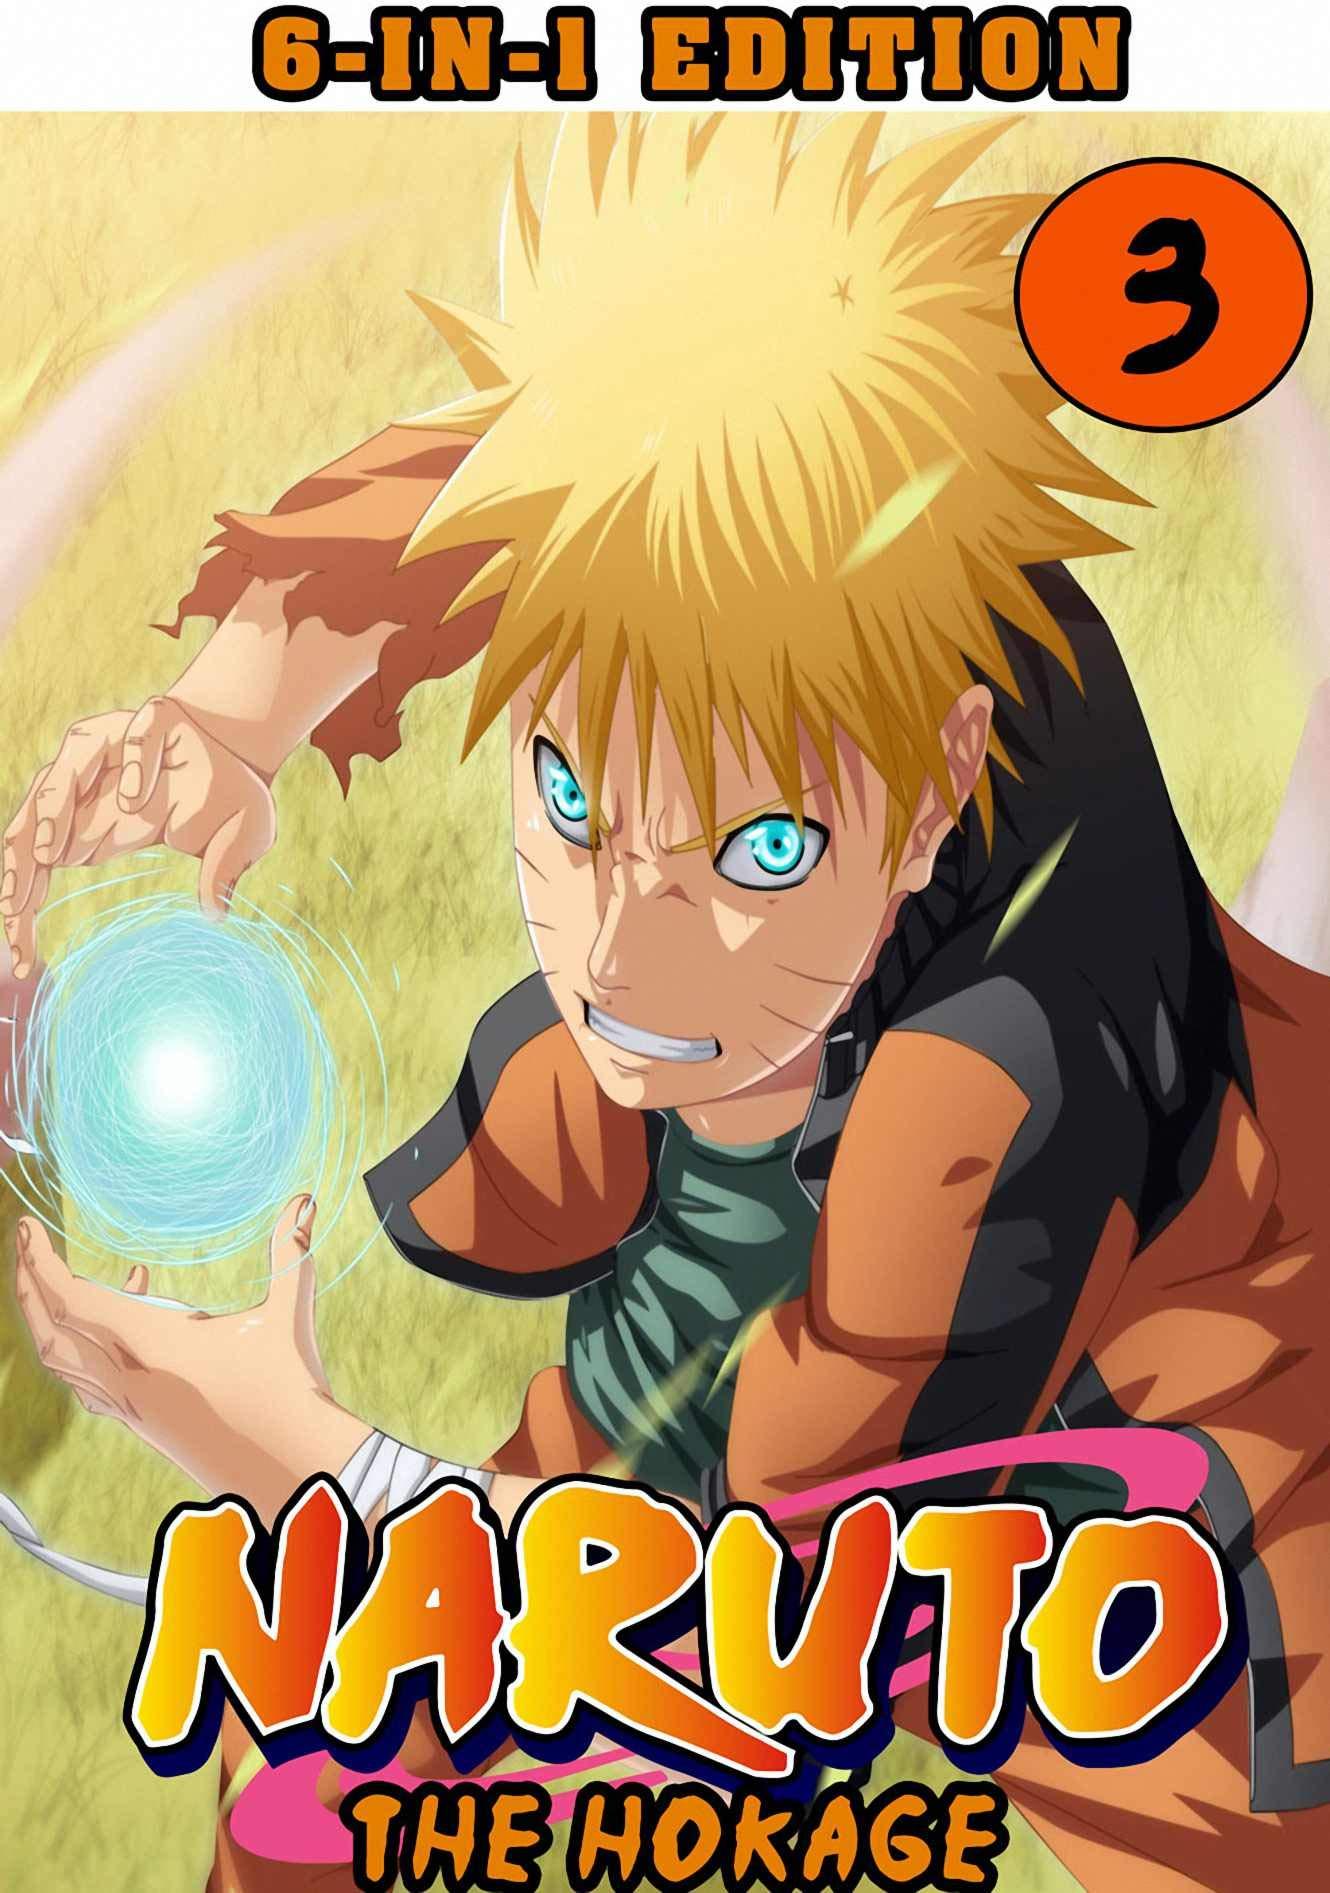 The Hokage: New 6-in-1 Edition Collection Book 3 - Naruto Graphic Novel Shonen Action Ninja Manga